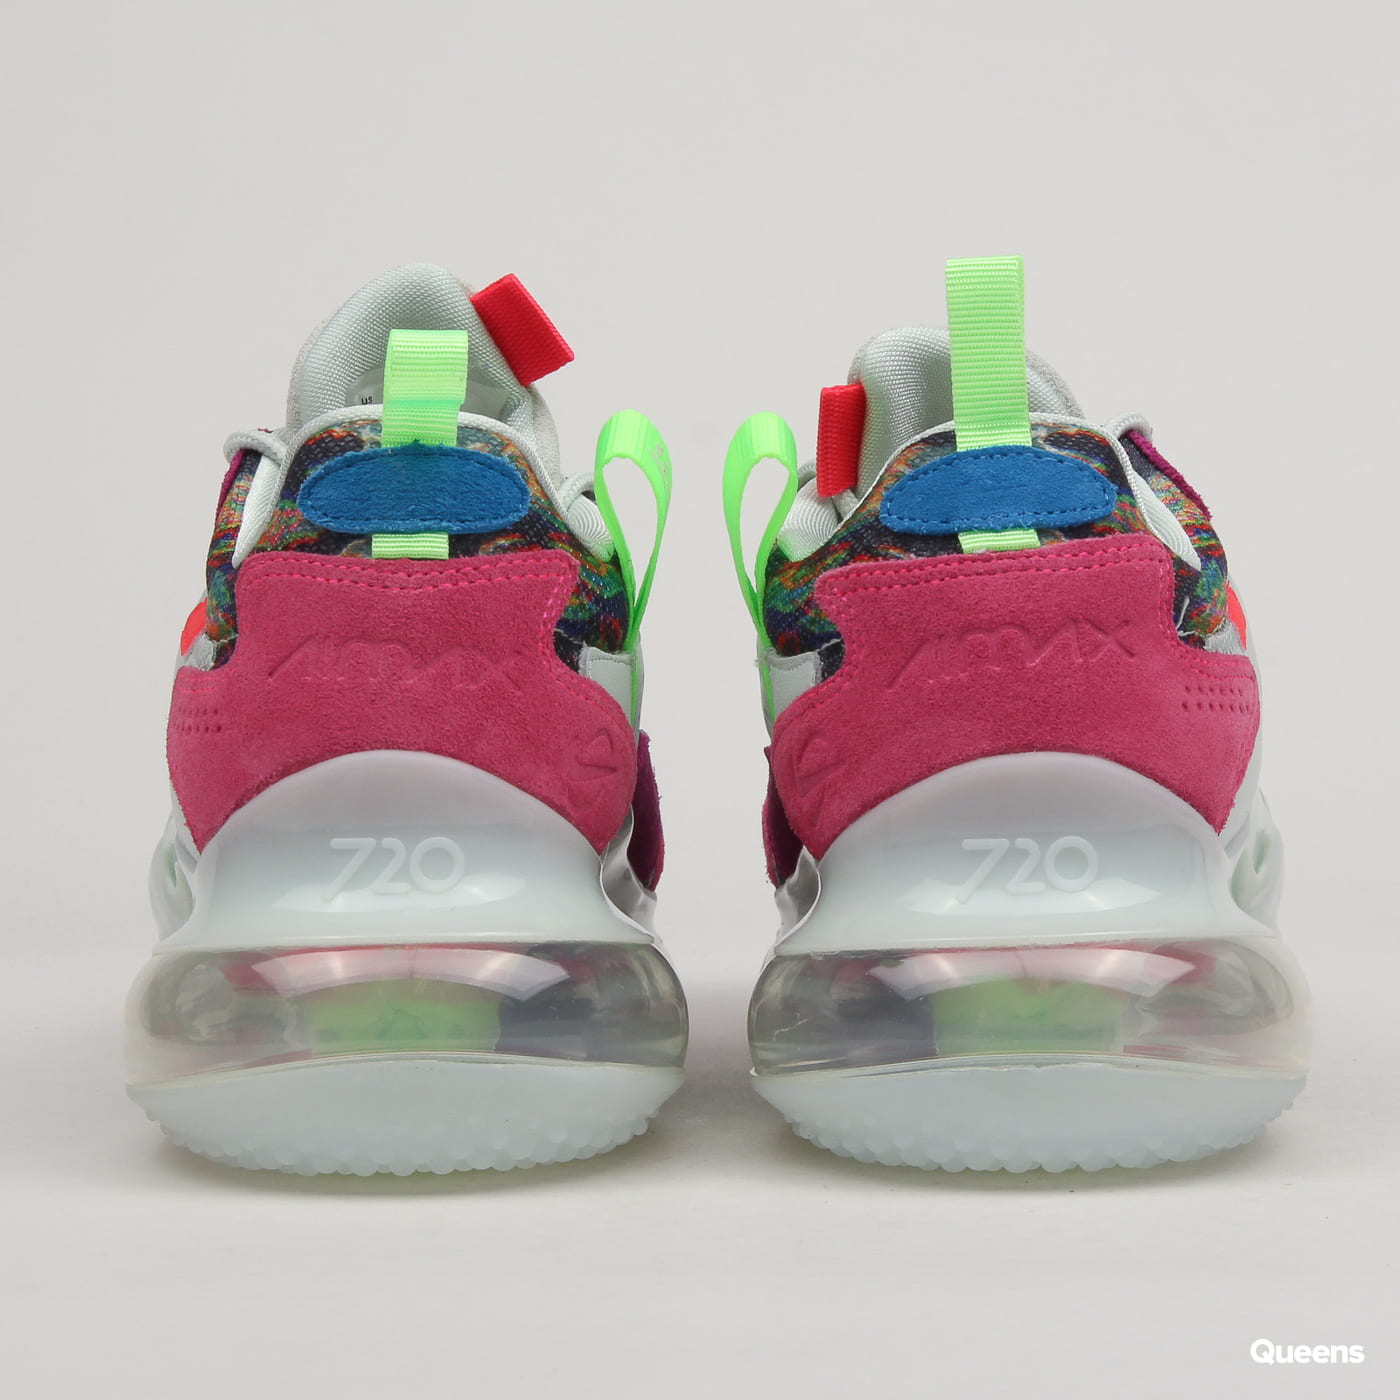 Nike Air Max 720 OBJ multi color hyper pink